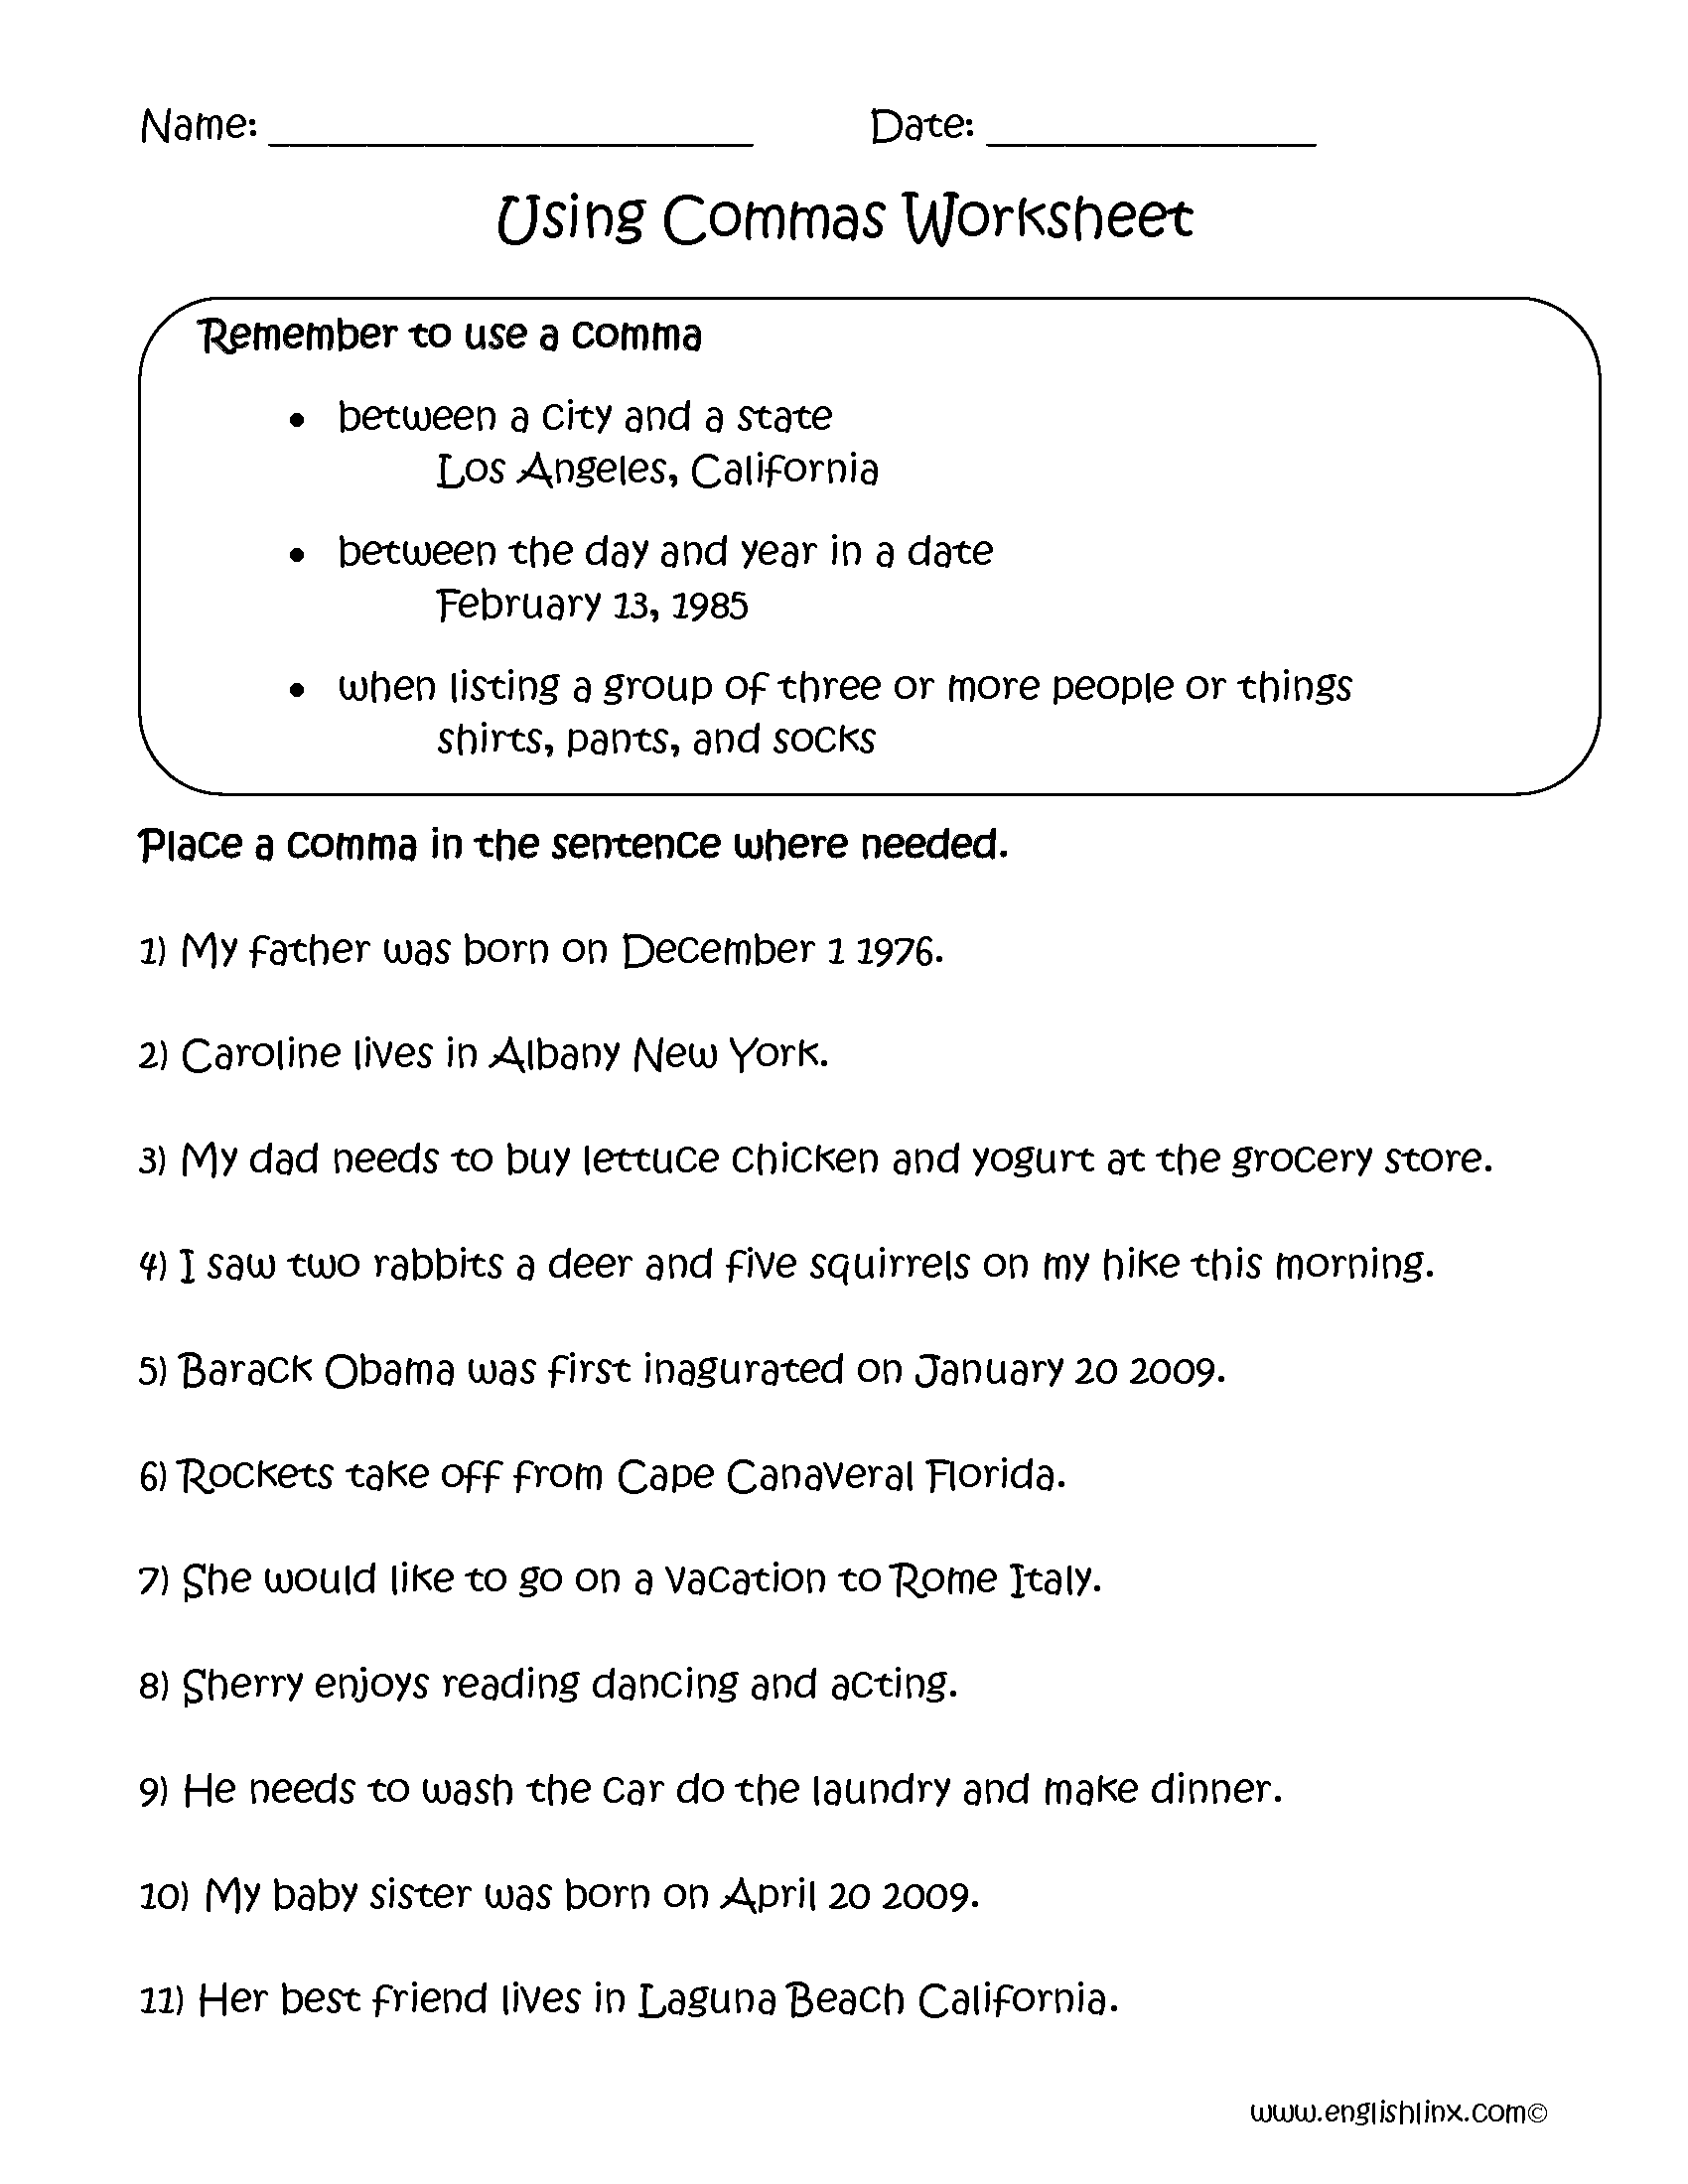 medium resolution of Pin on Englishlinx.com Board